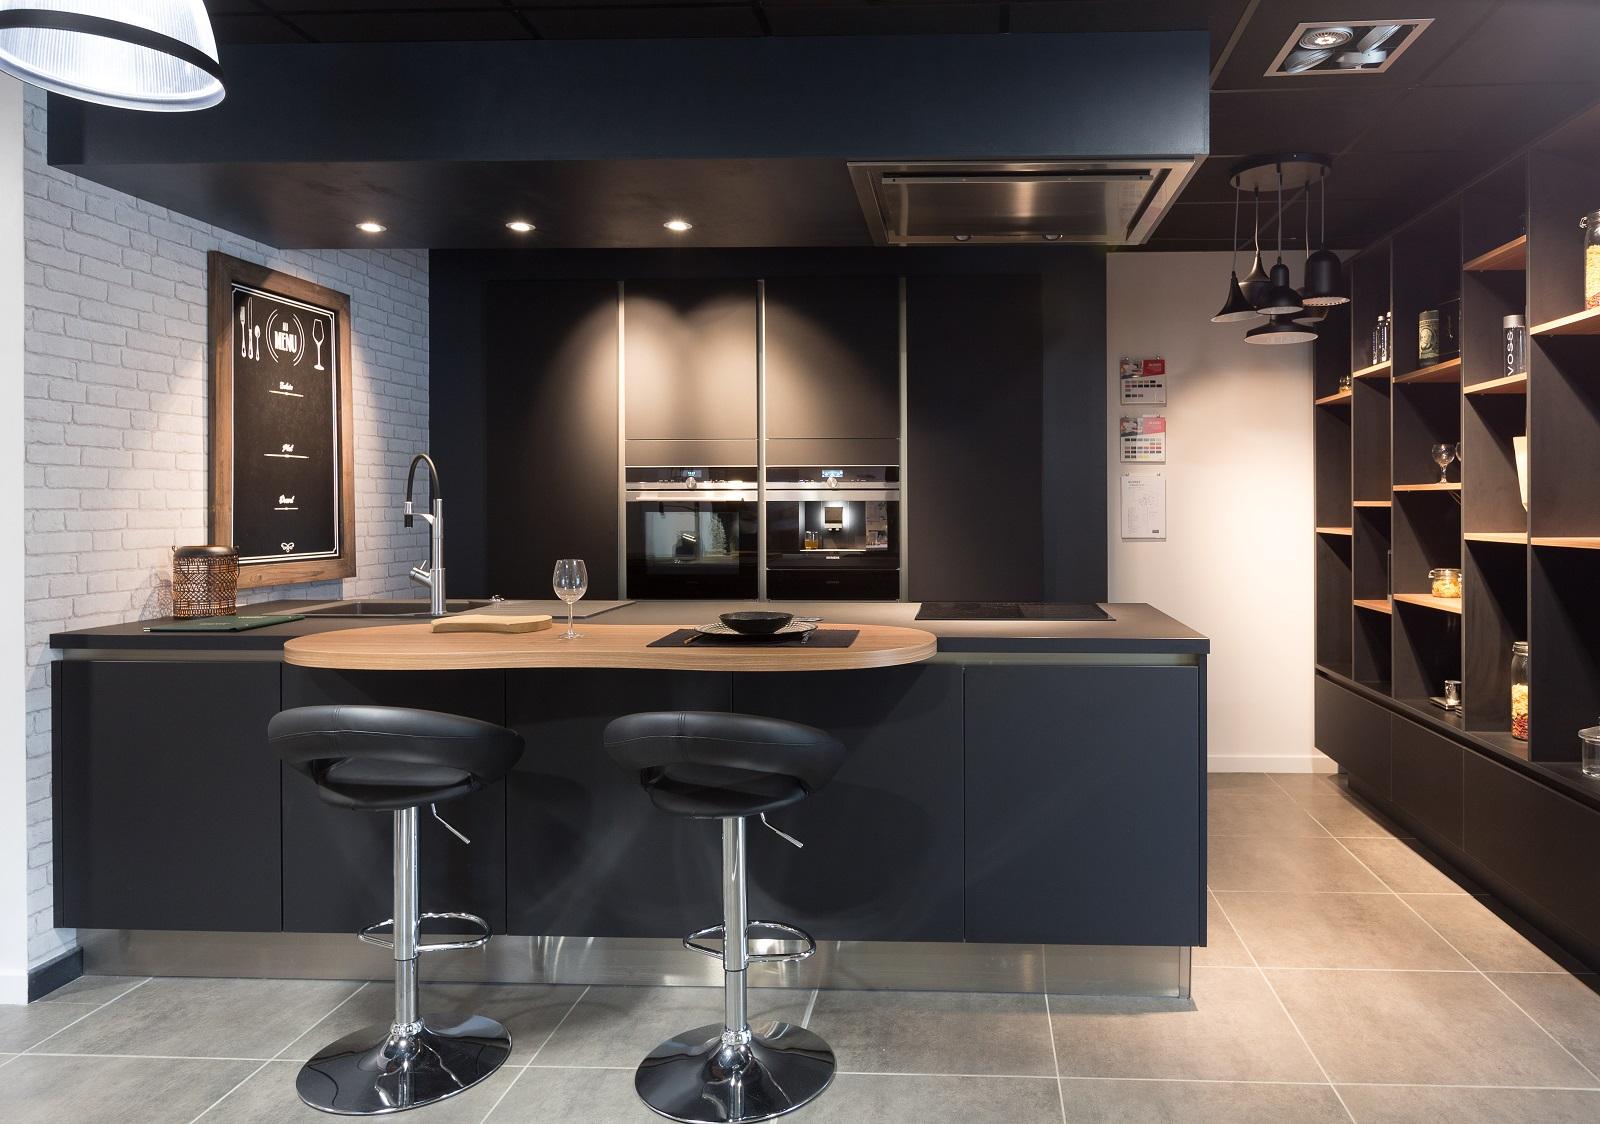 magasin deco basse goulaine magasin deco basse goulaine with magasin deco basse goulaine. Black Bedroom Furniture Sets. Home Design Ideas